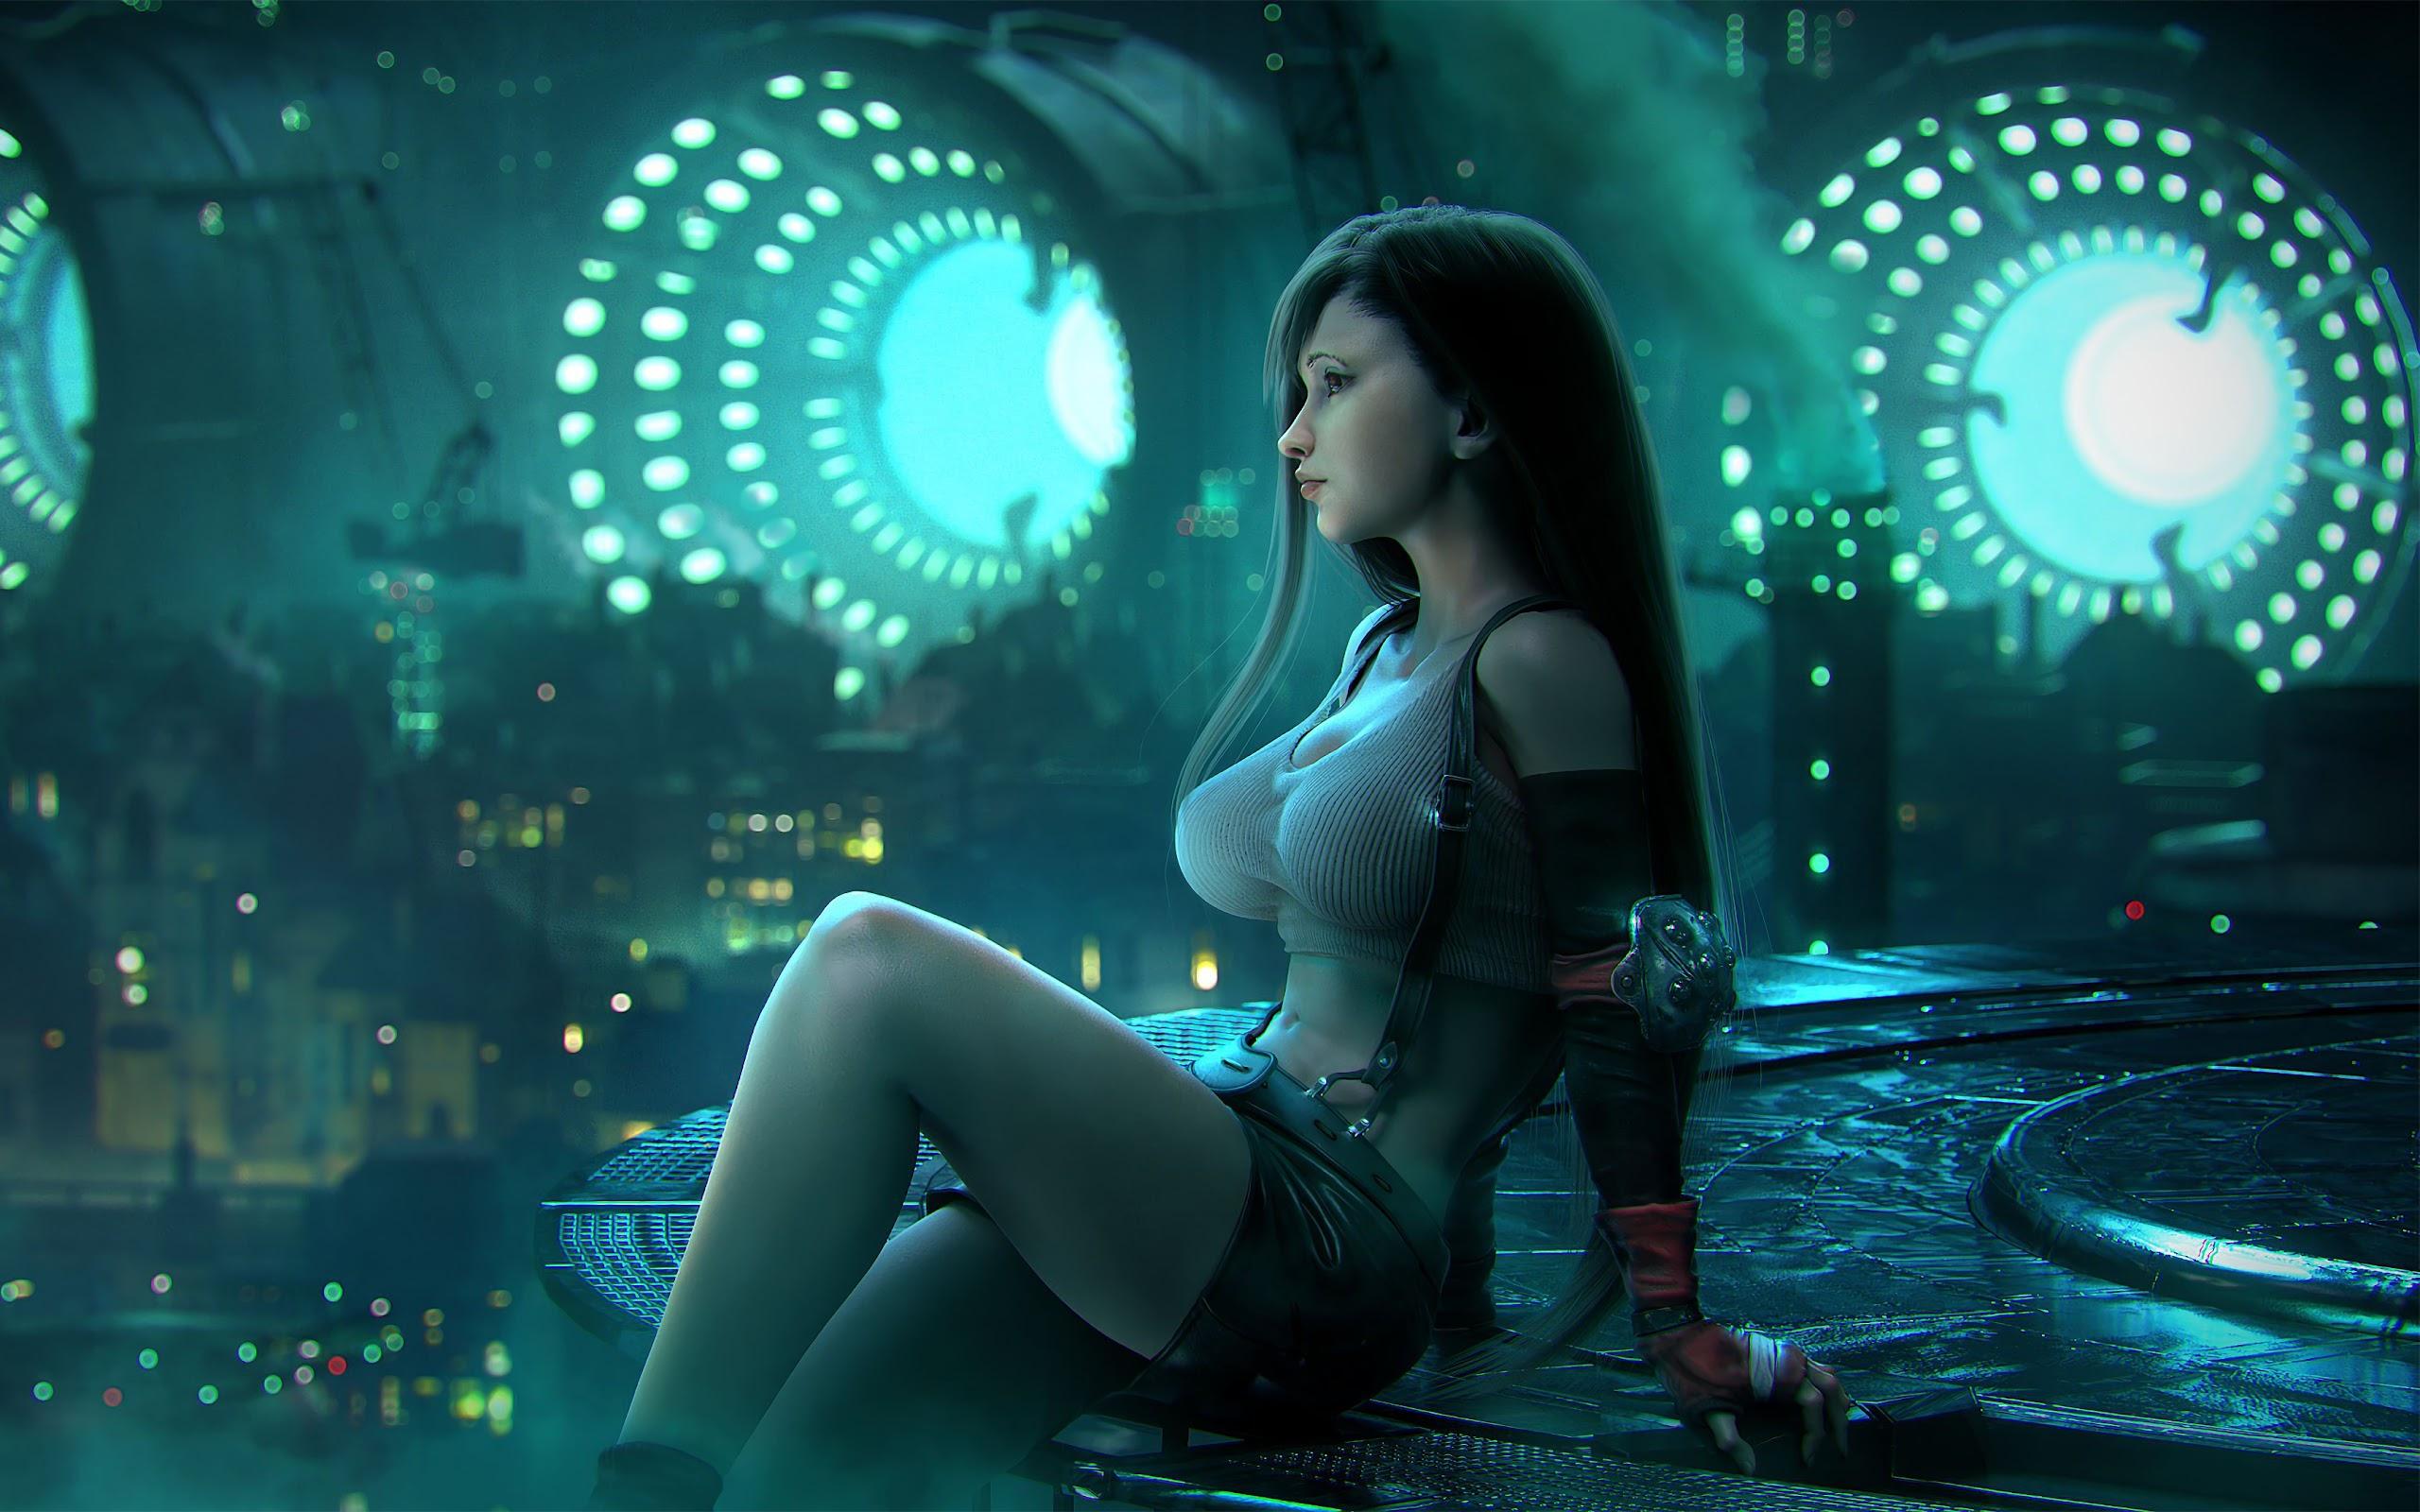 2932x2932 Tifa Lockhart Final Fantasy Artwork Ipad Pro: Tifa Lockhart, Final Fantasy 7 Remake, 4K, #6 Wallpaper